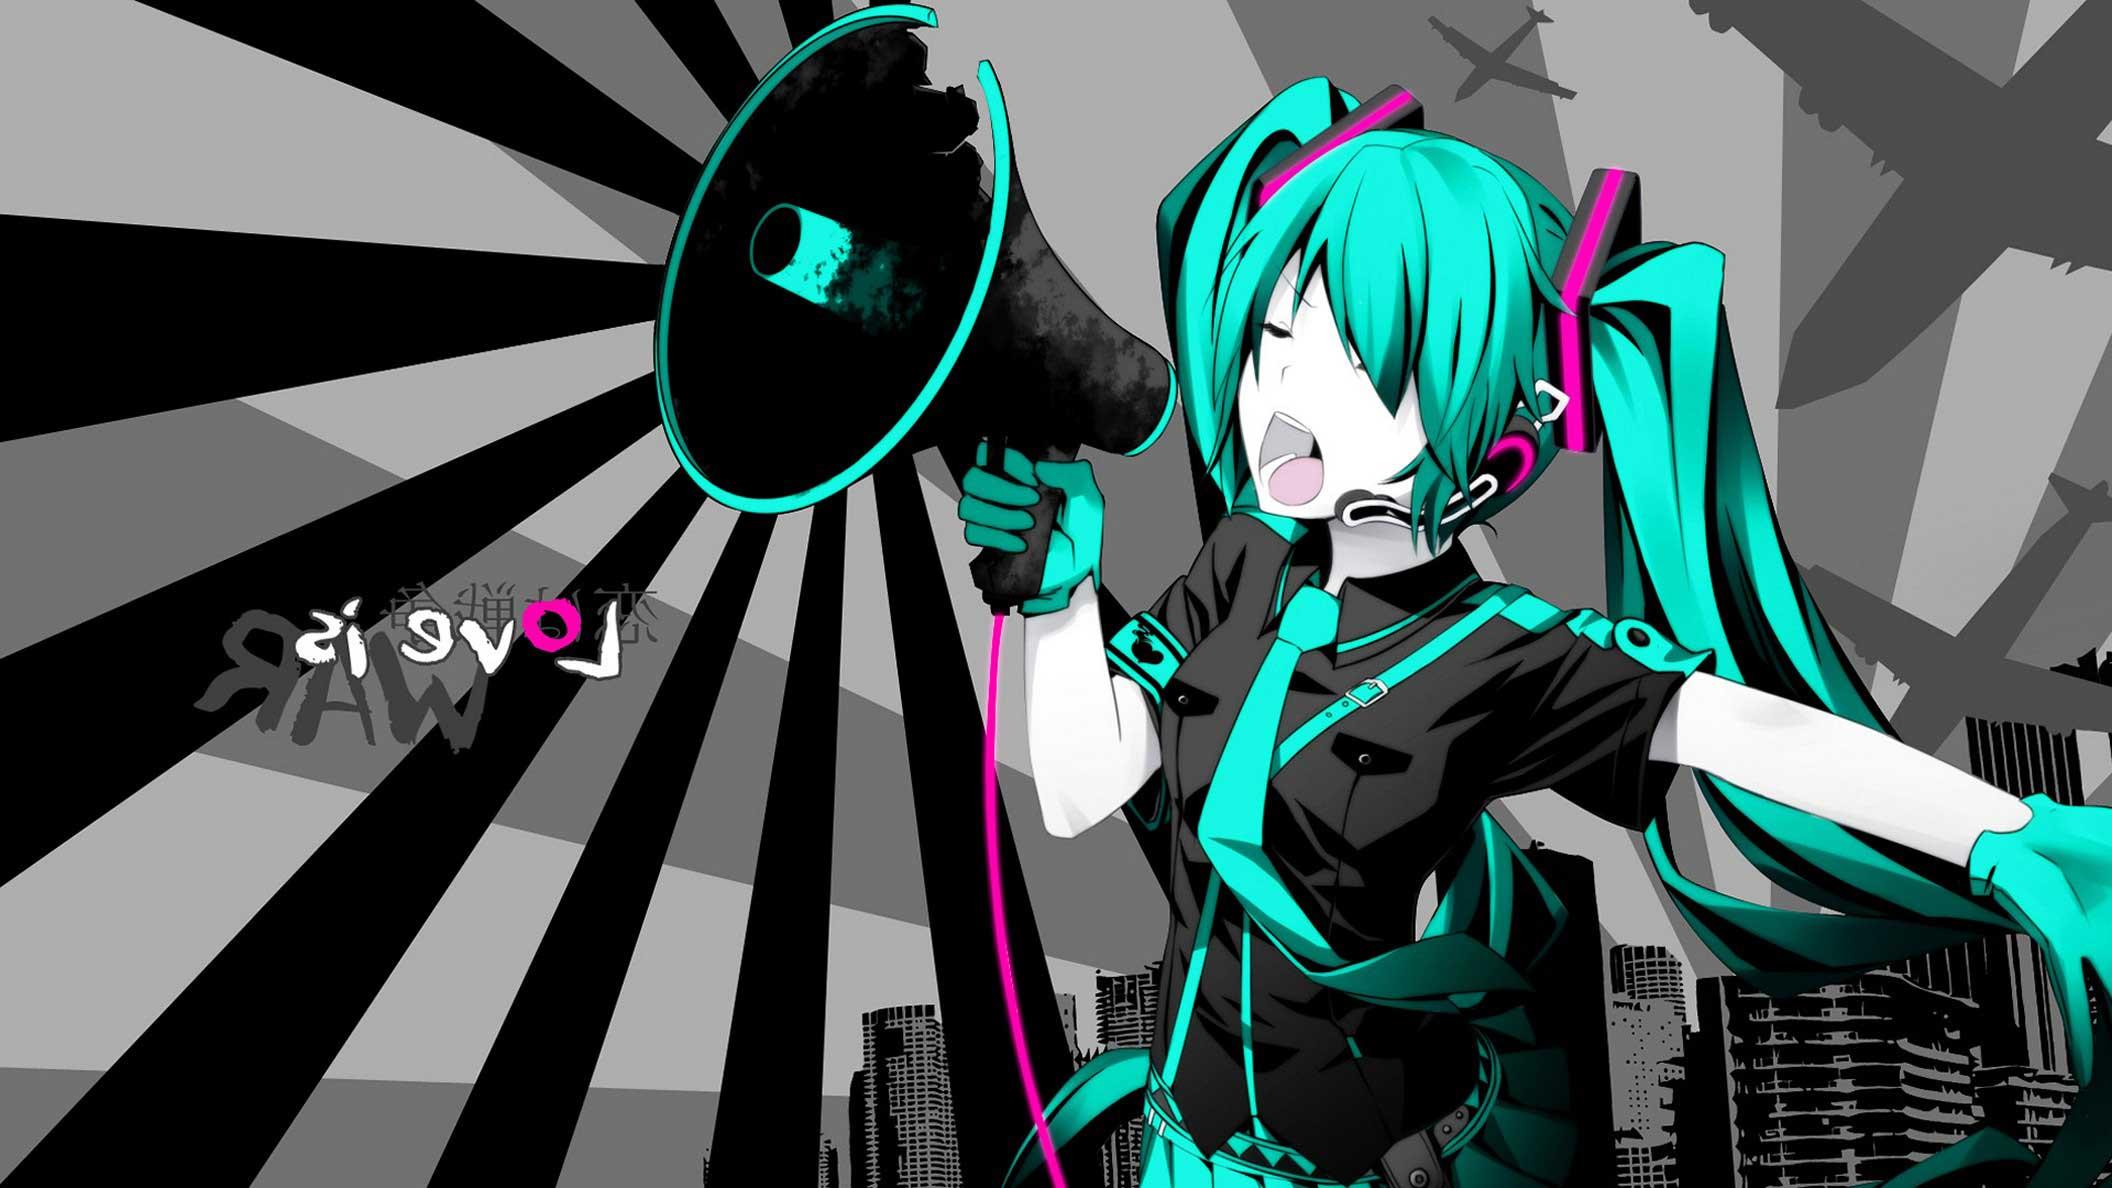 Best anime wallpaper wallpapersafari - Best anime desktop backgrounds ...